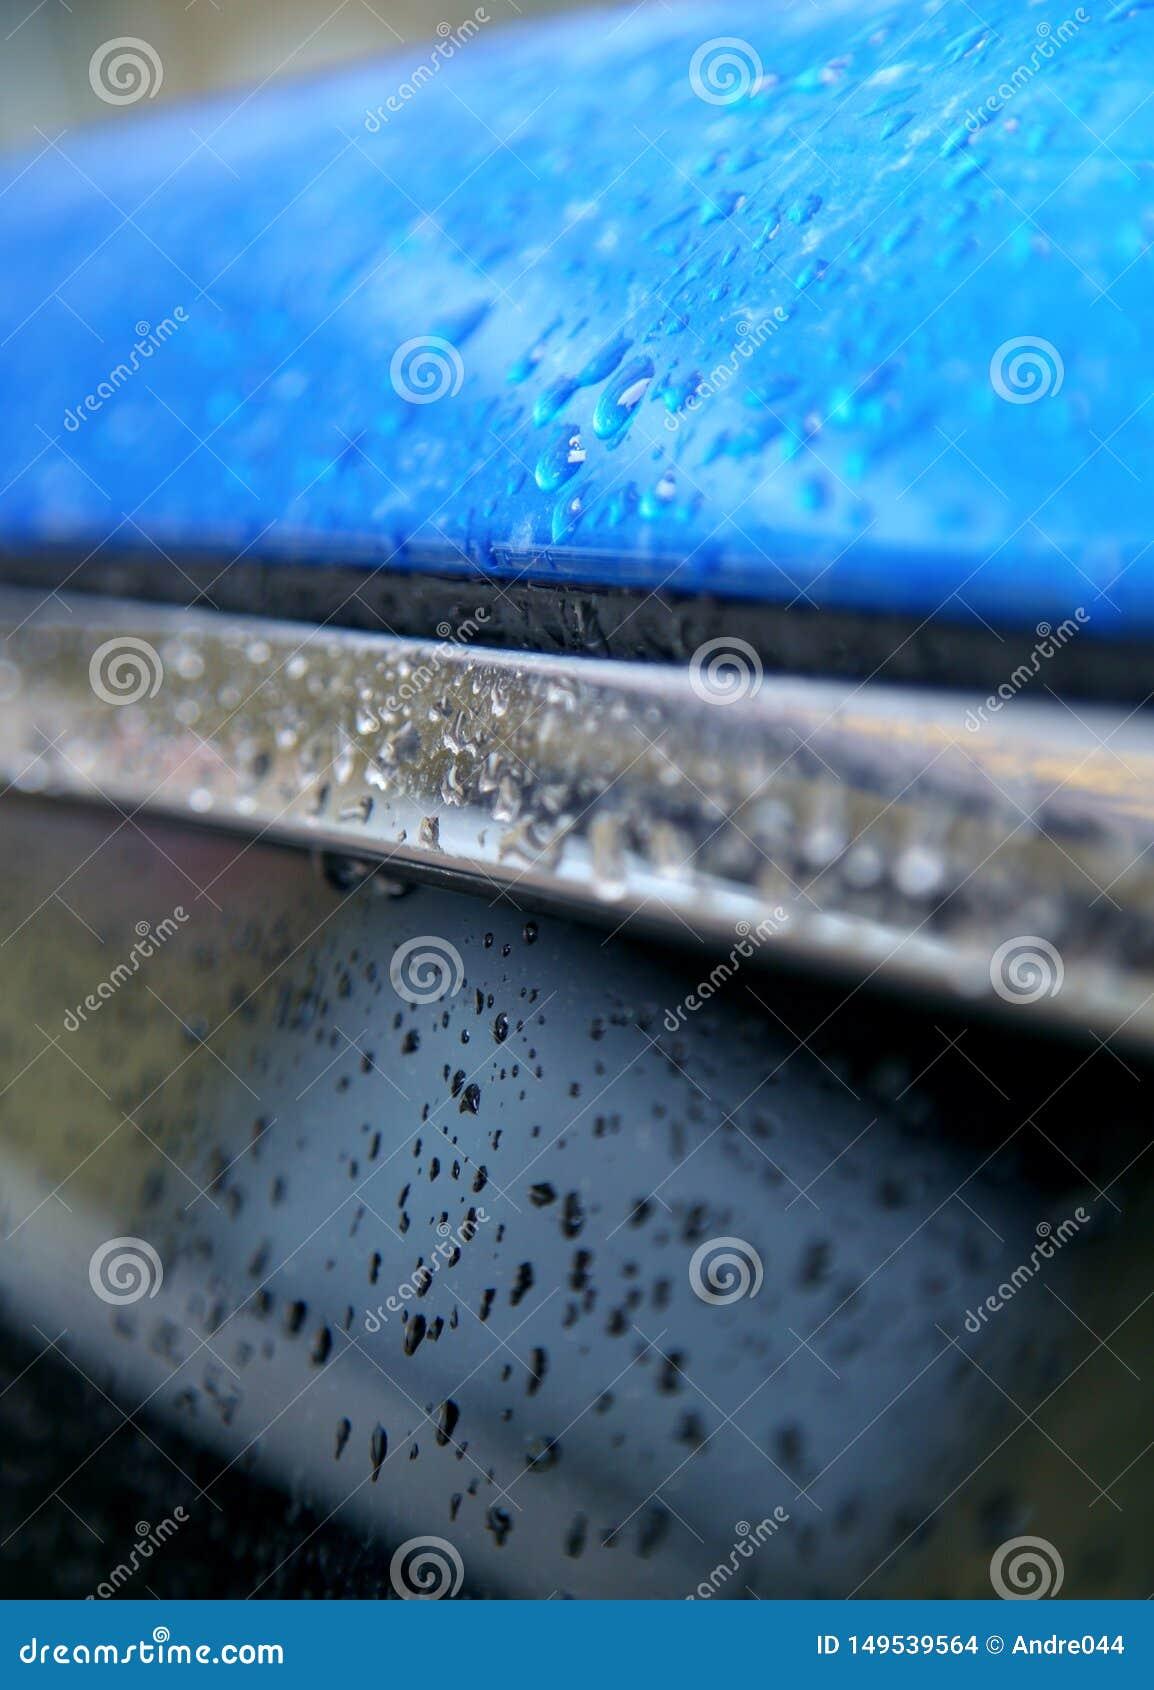 Blue metallic surface.